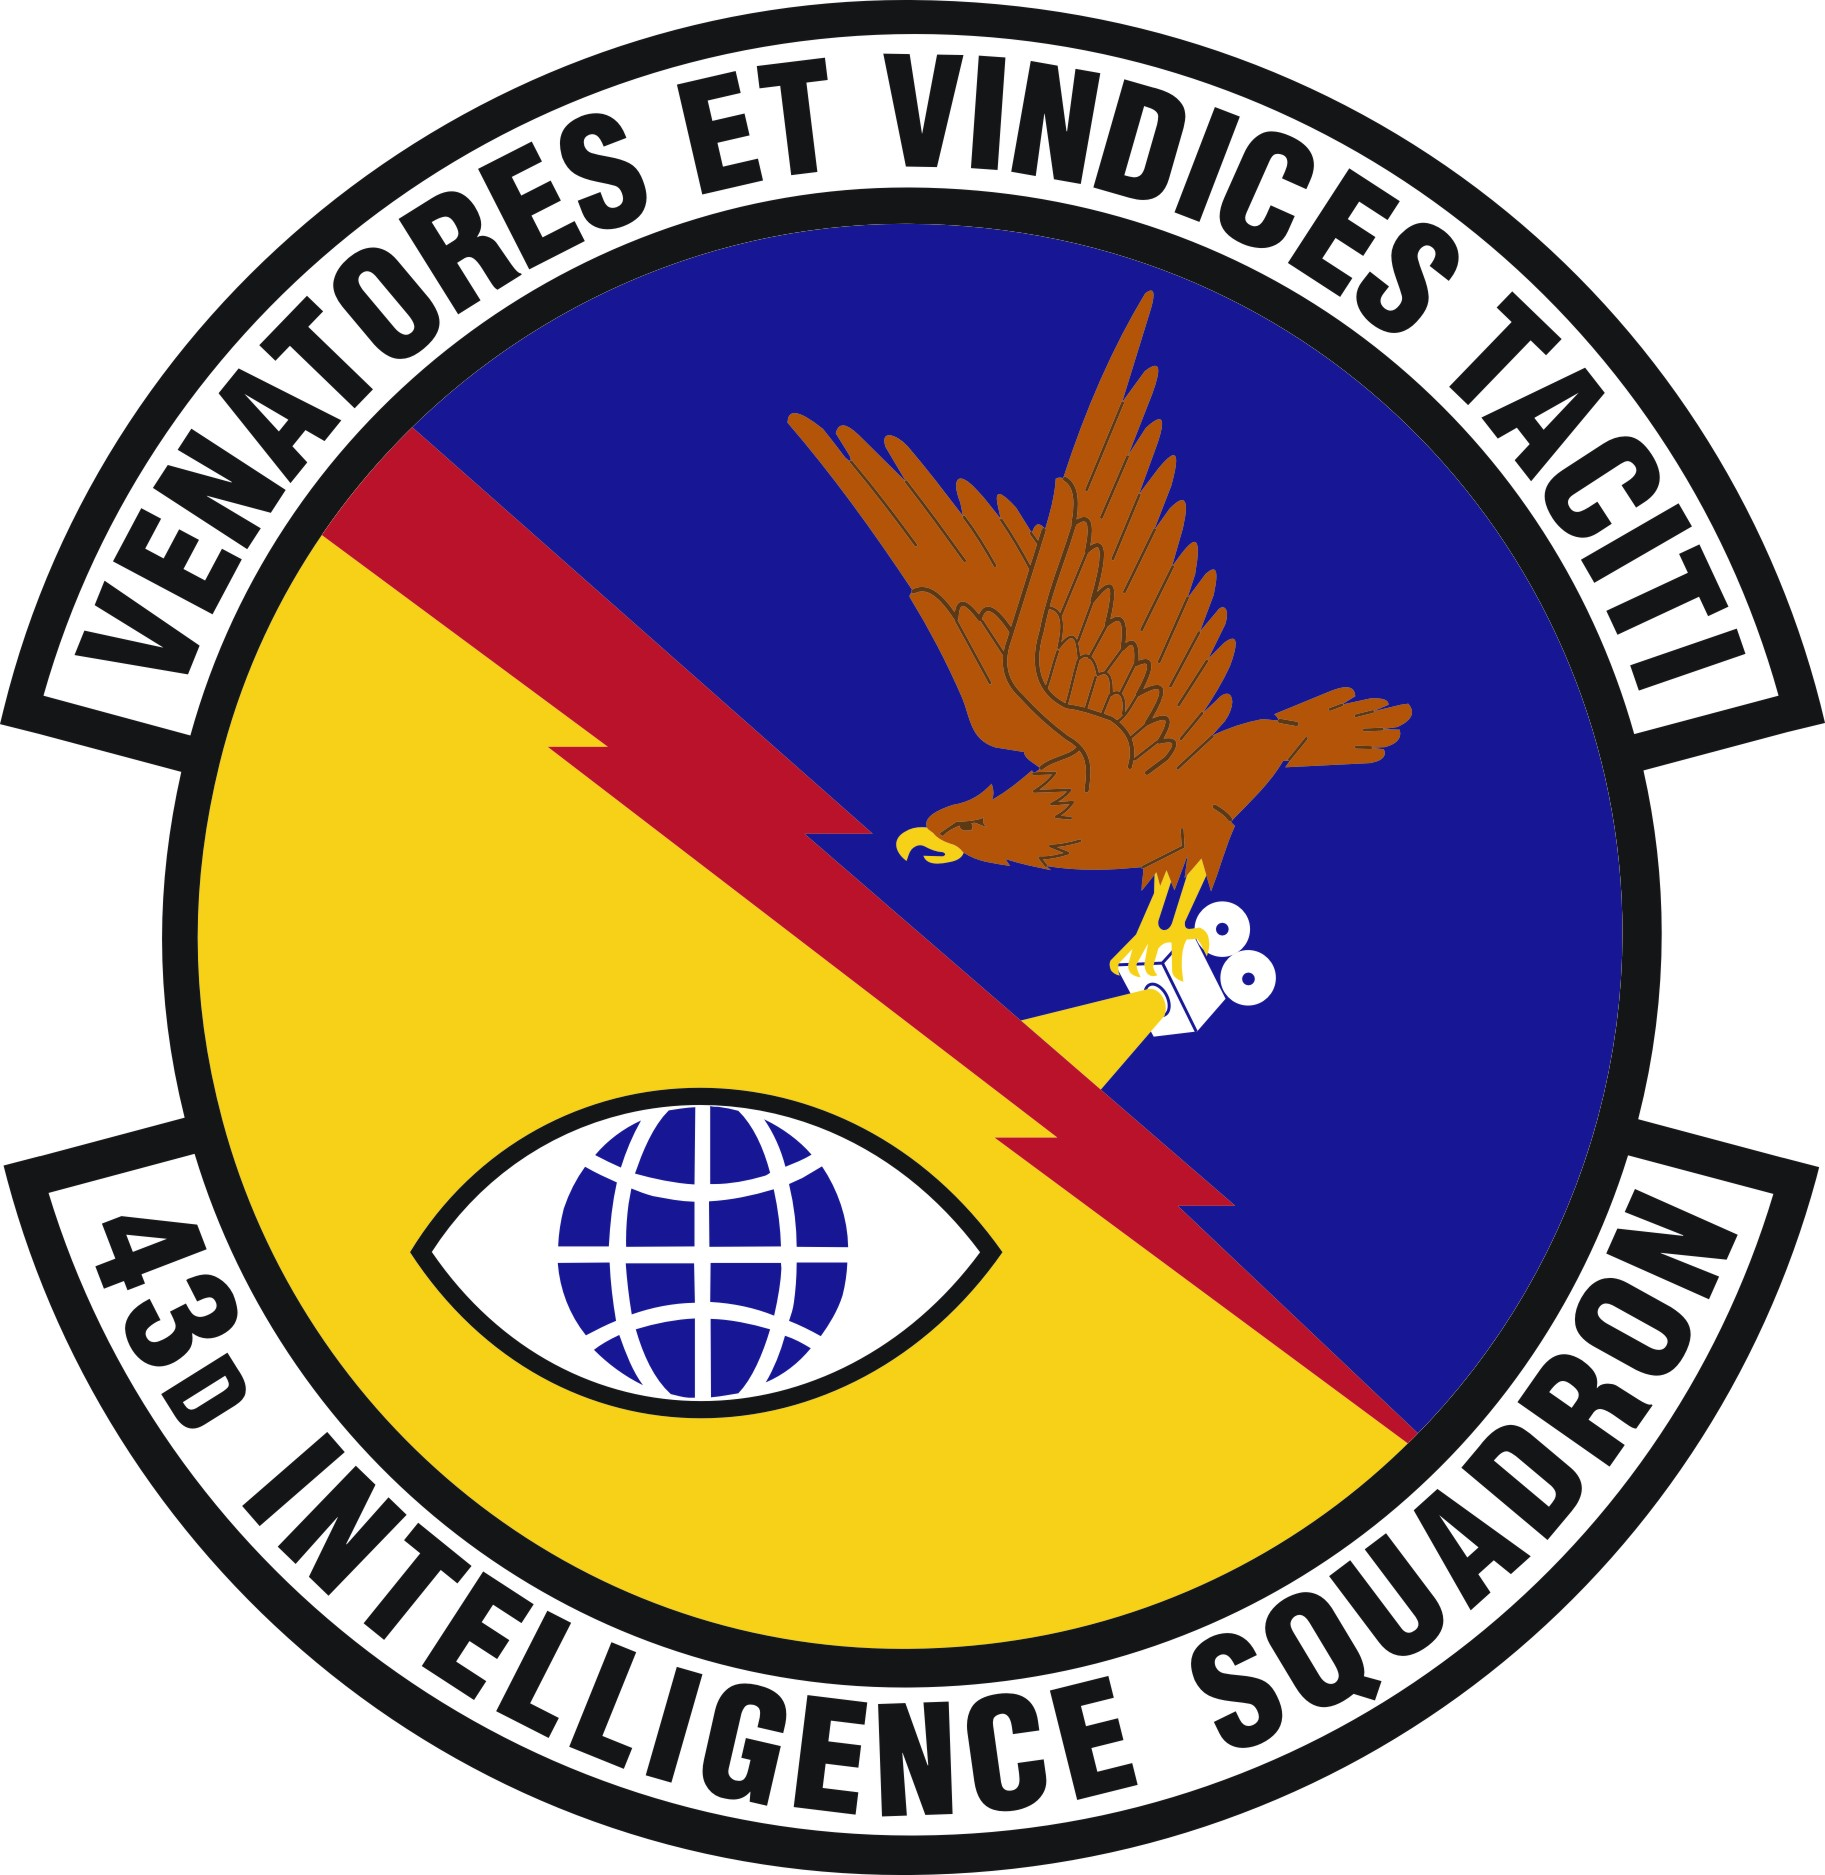 43rd Intelligence Squadron Wikipedia